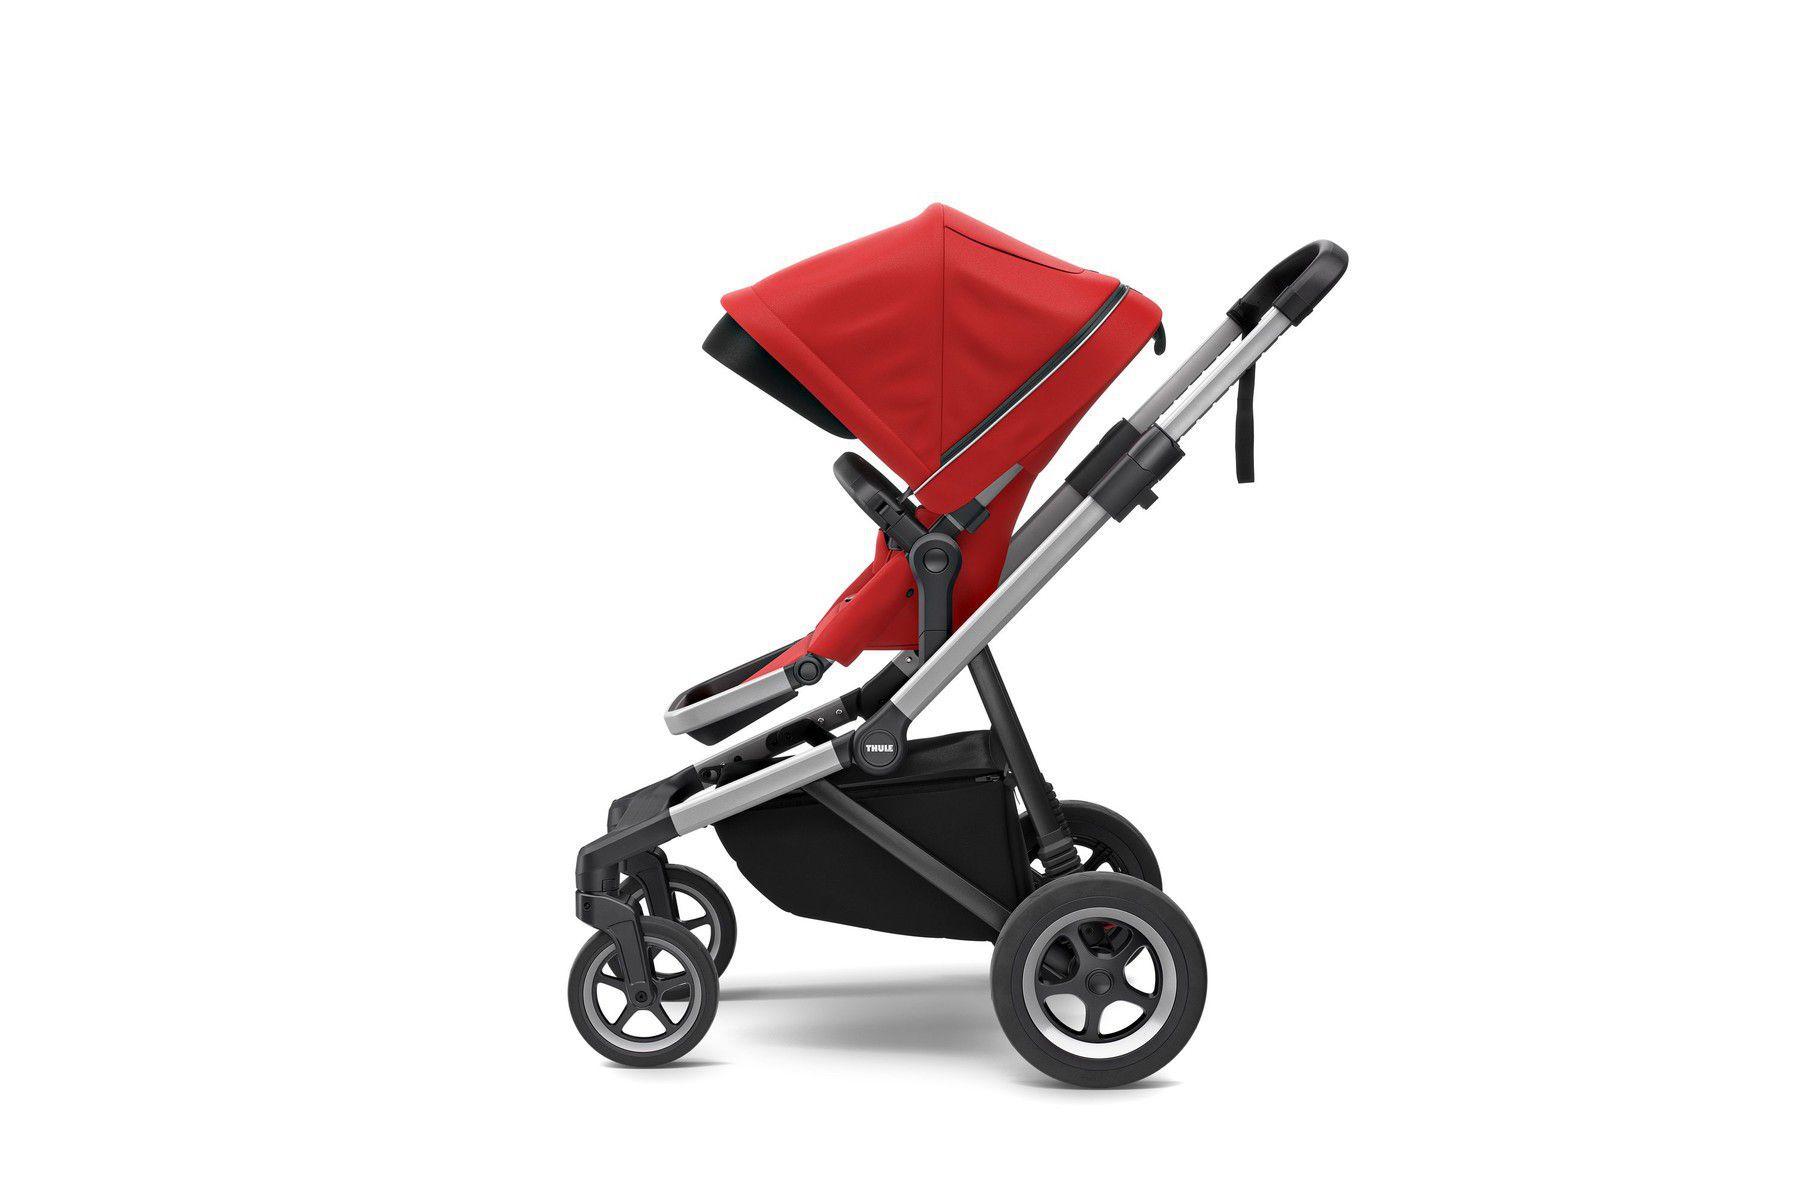 Carrrinho Sleek - Energy Red - Thule